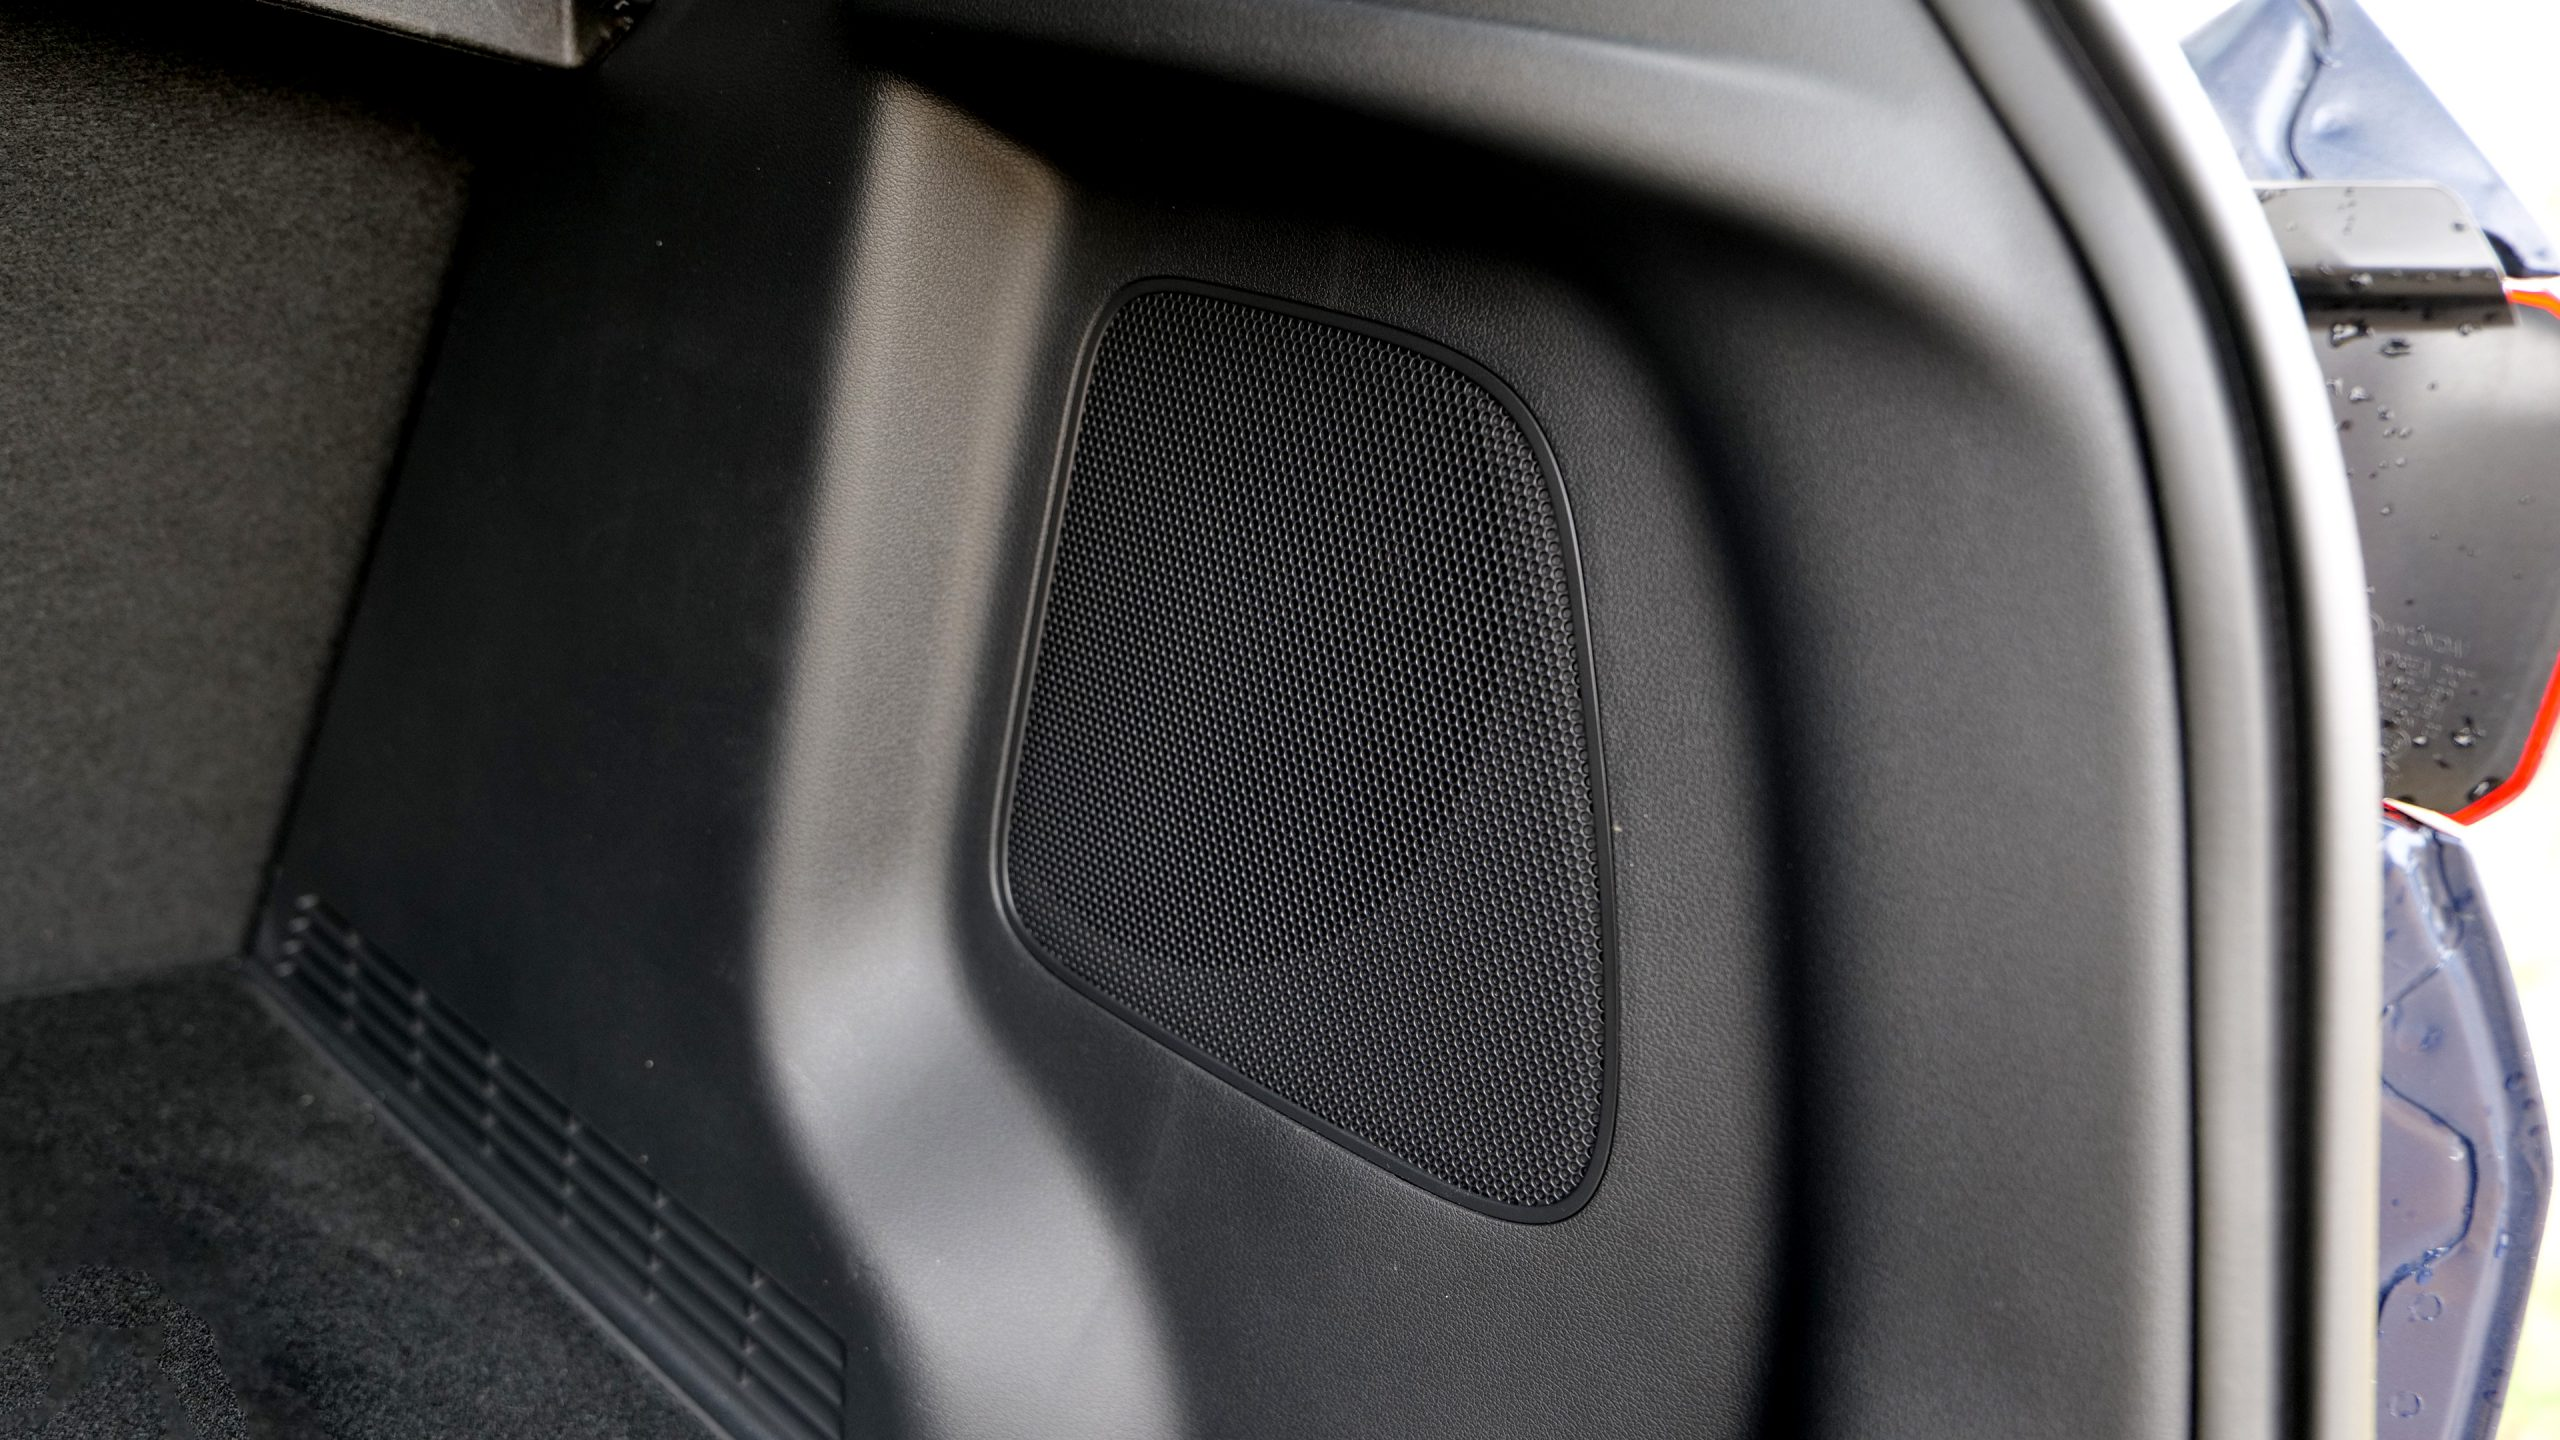 Hyundai Kona subwoofer